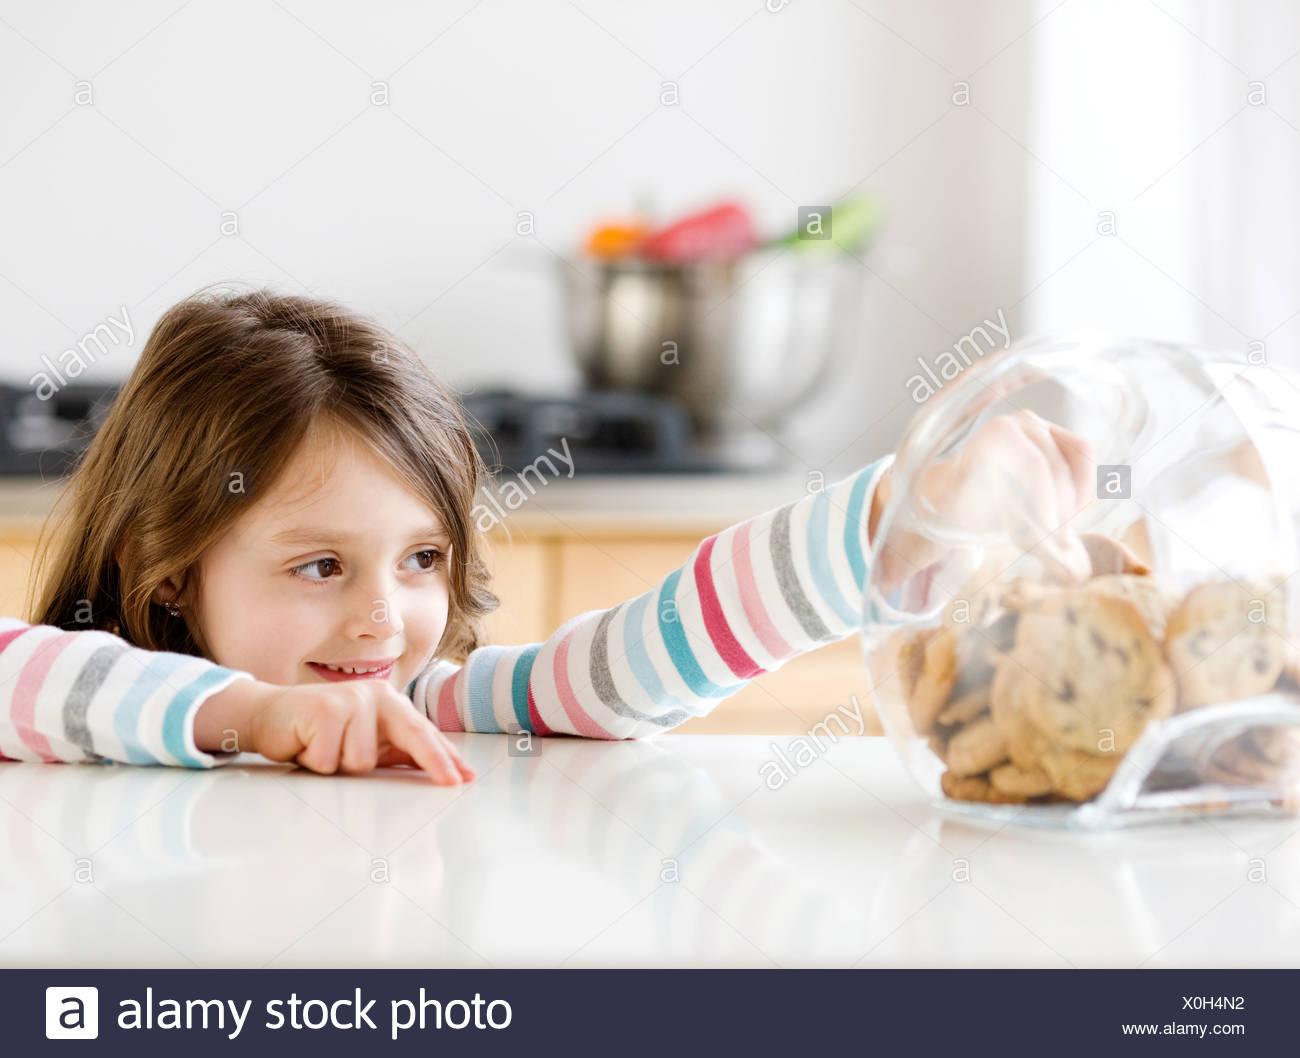 Girl reaching into cookie jar - Stock Image